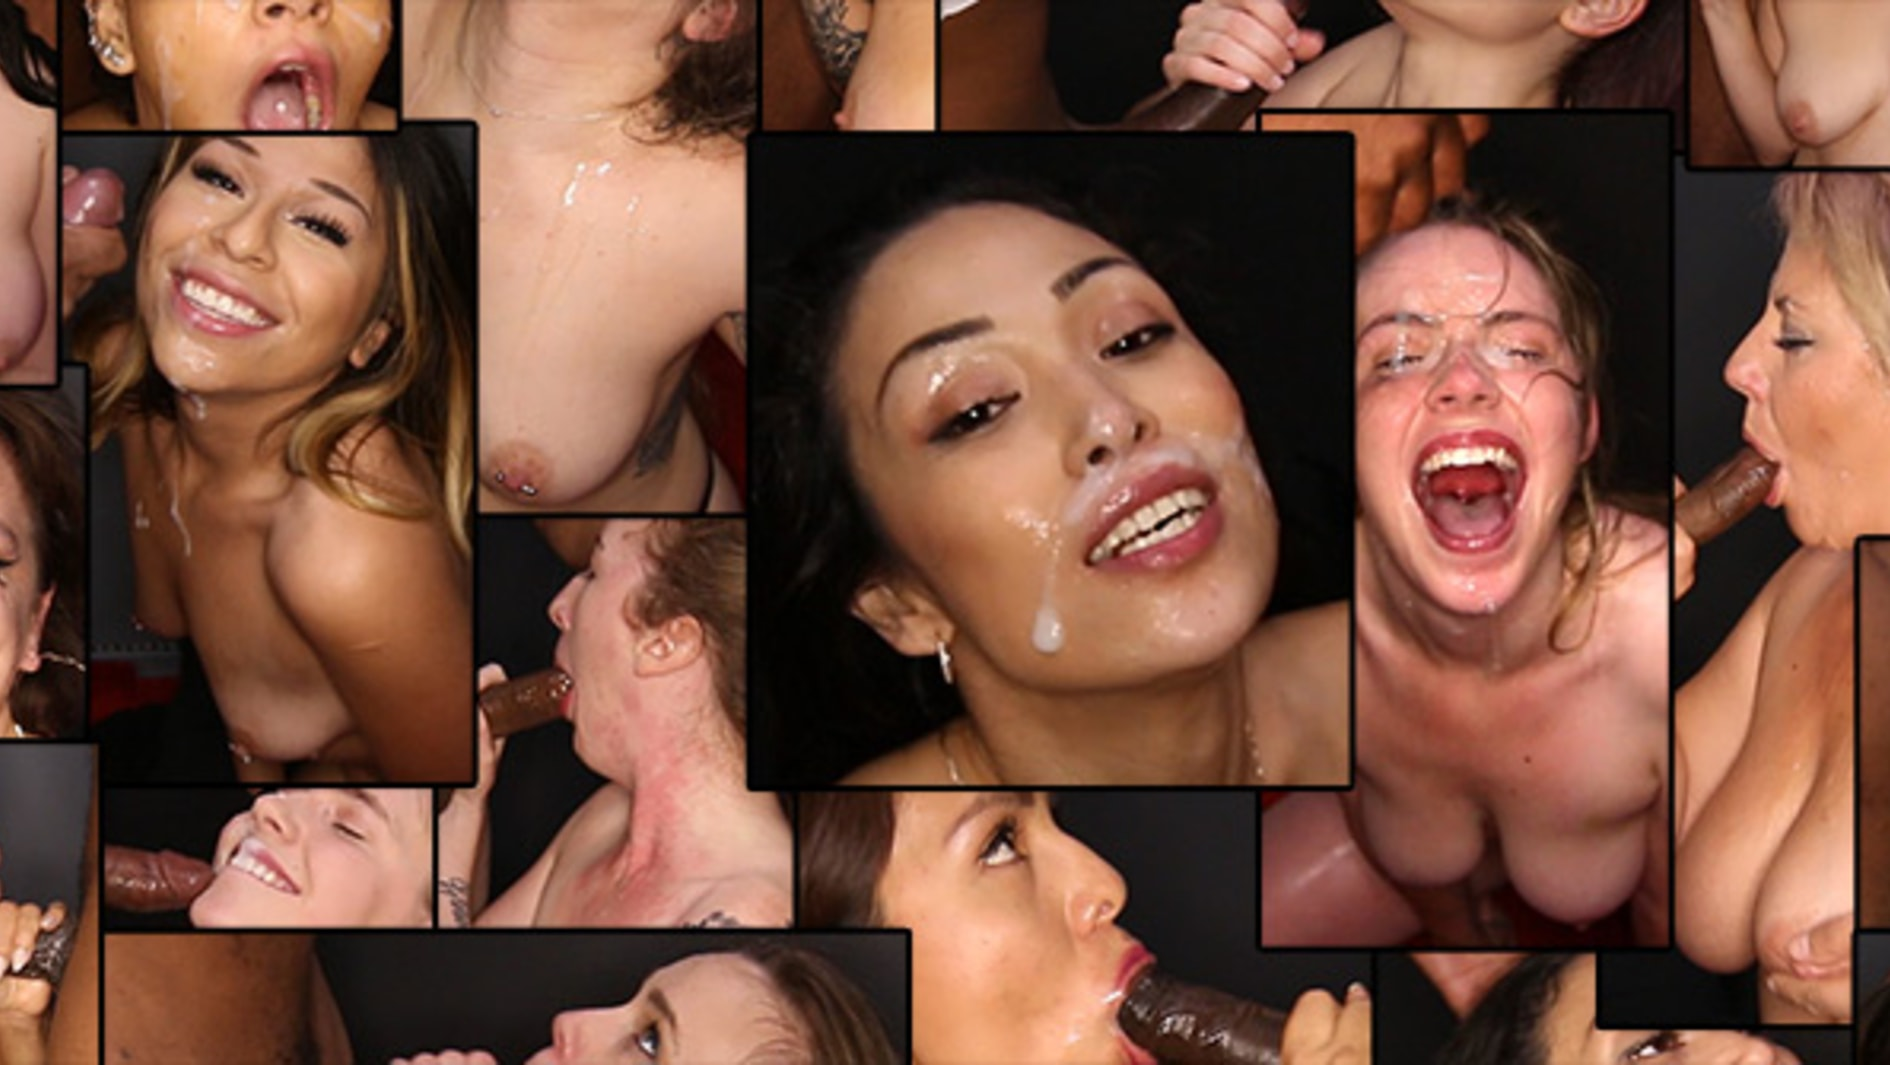 Blowbanggirls Com Videos Blowbang Girls Blowjobs Blowbang